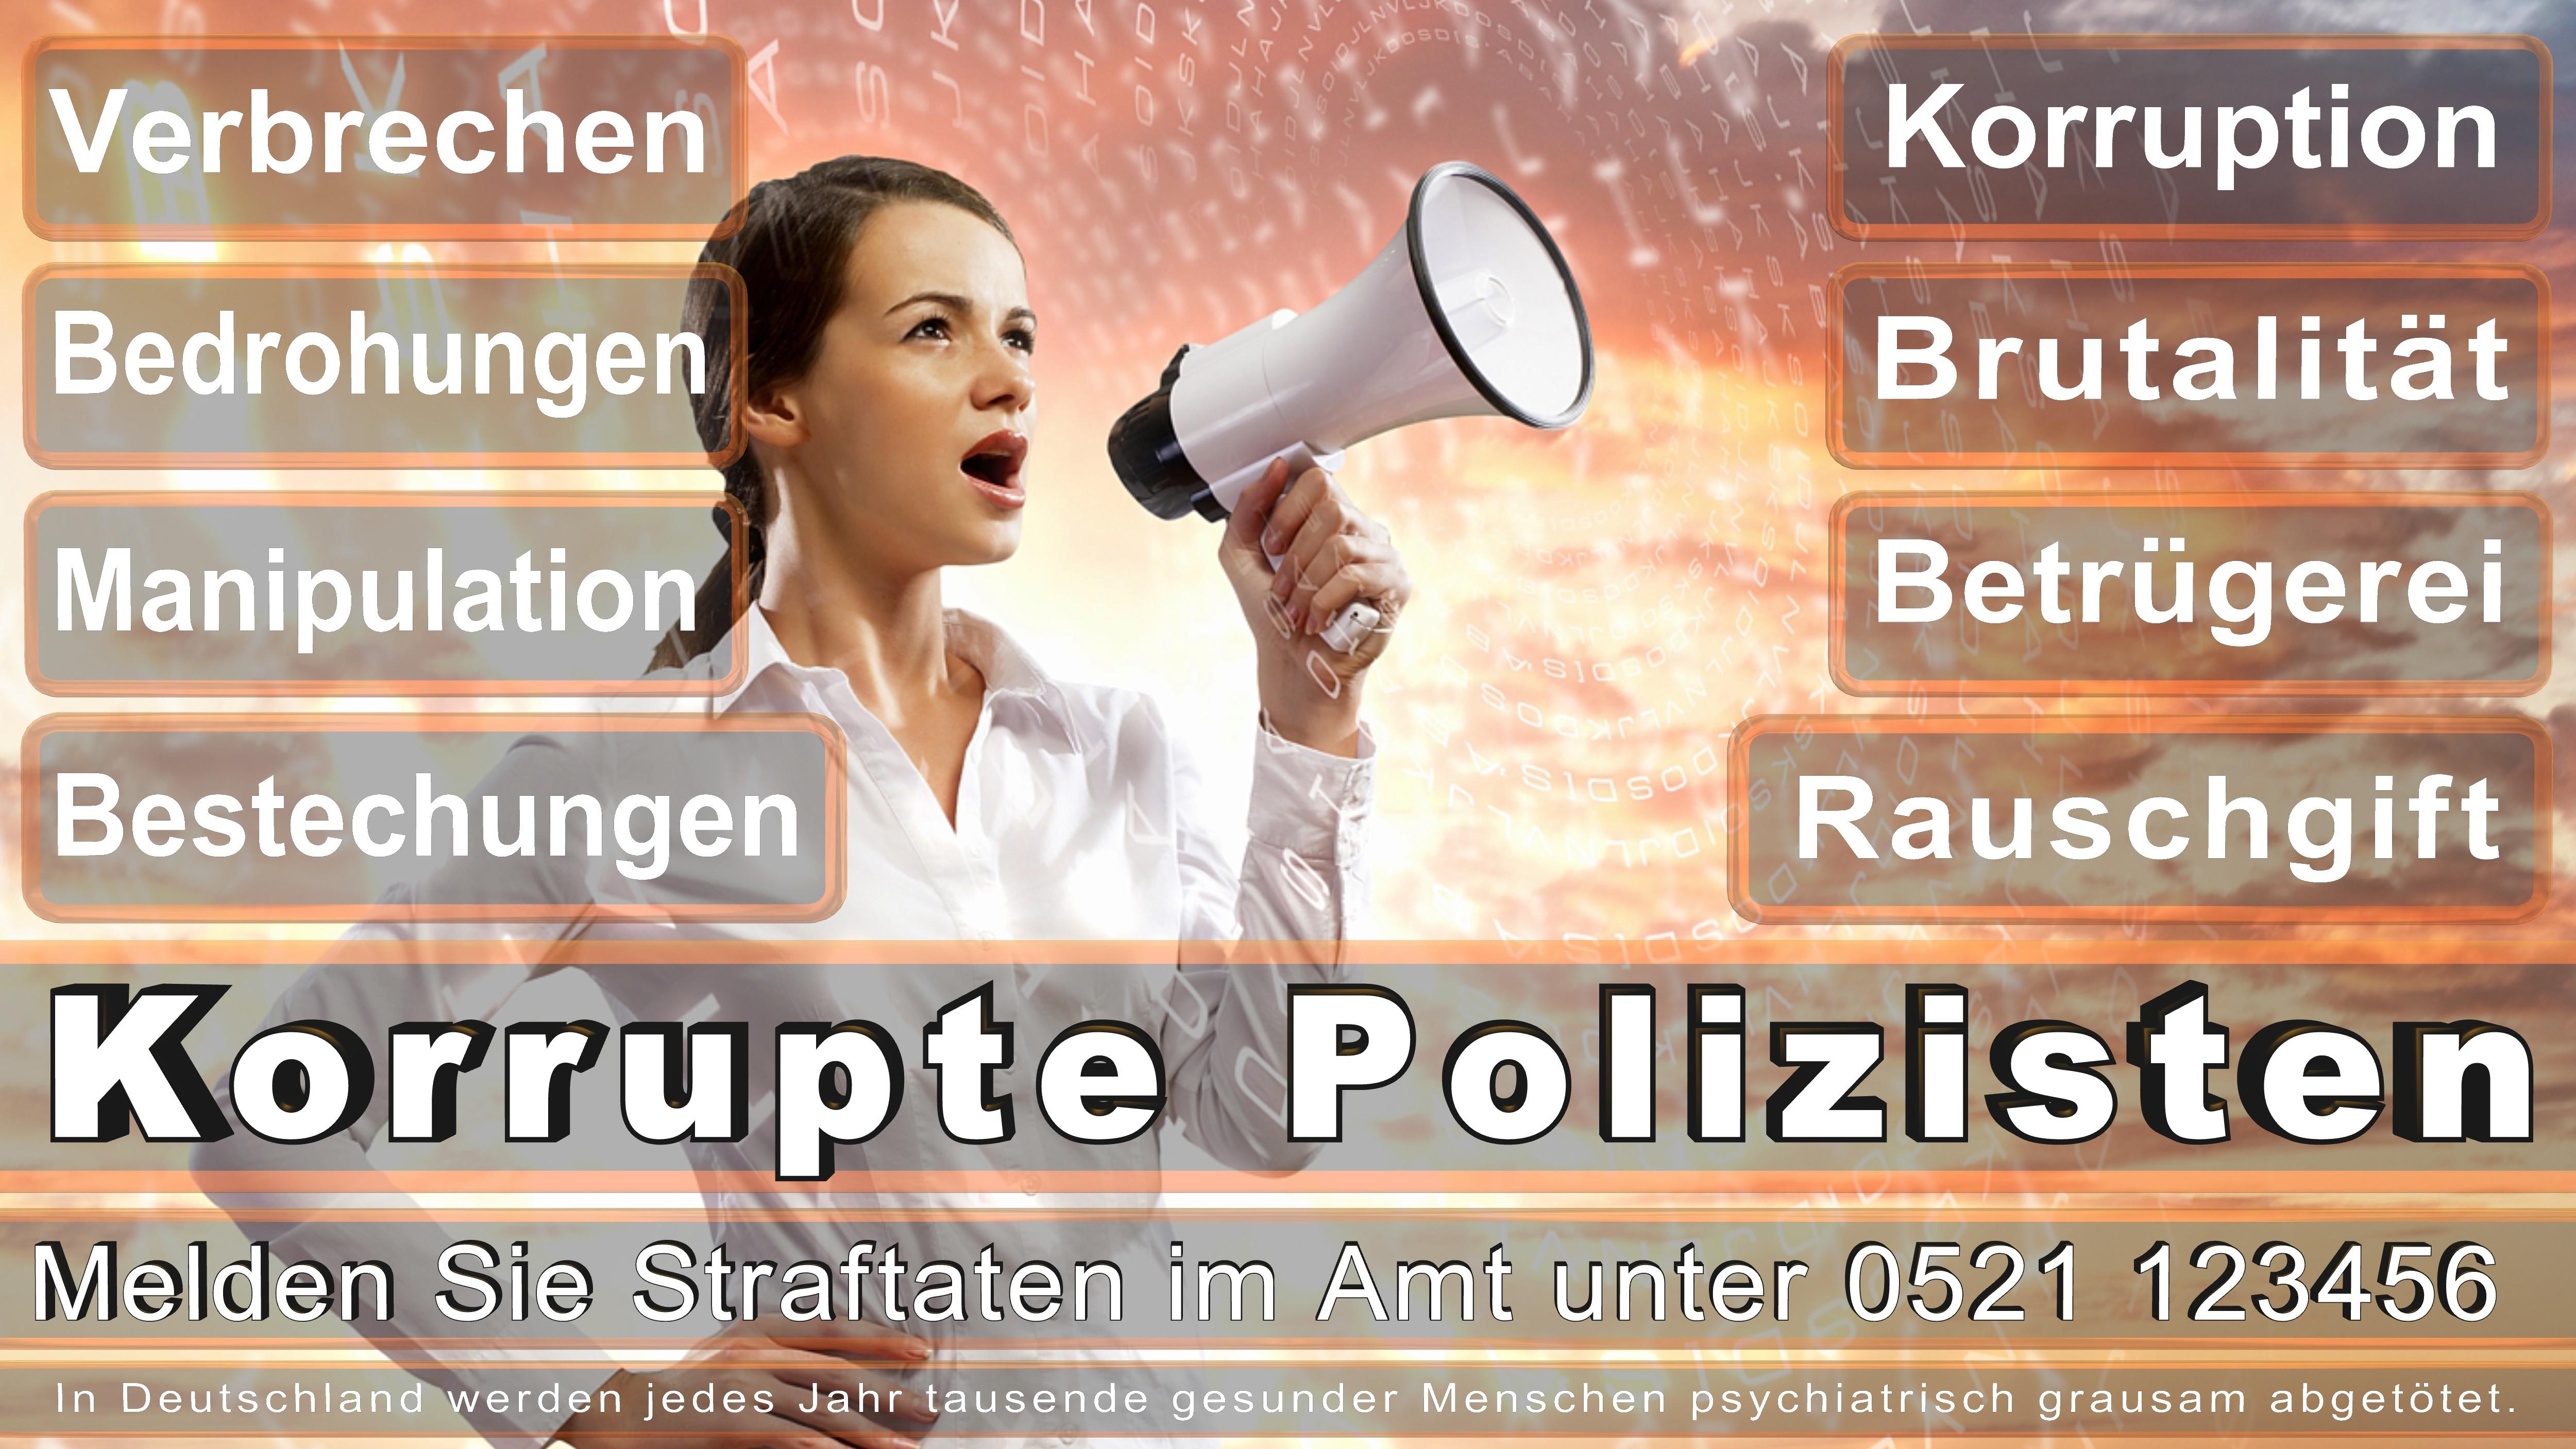 Polizei-Bielefeld-Polizei-Bielefeld-Polizei-Bielefeld (254)